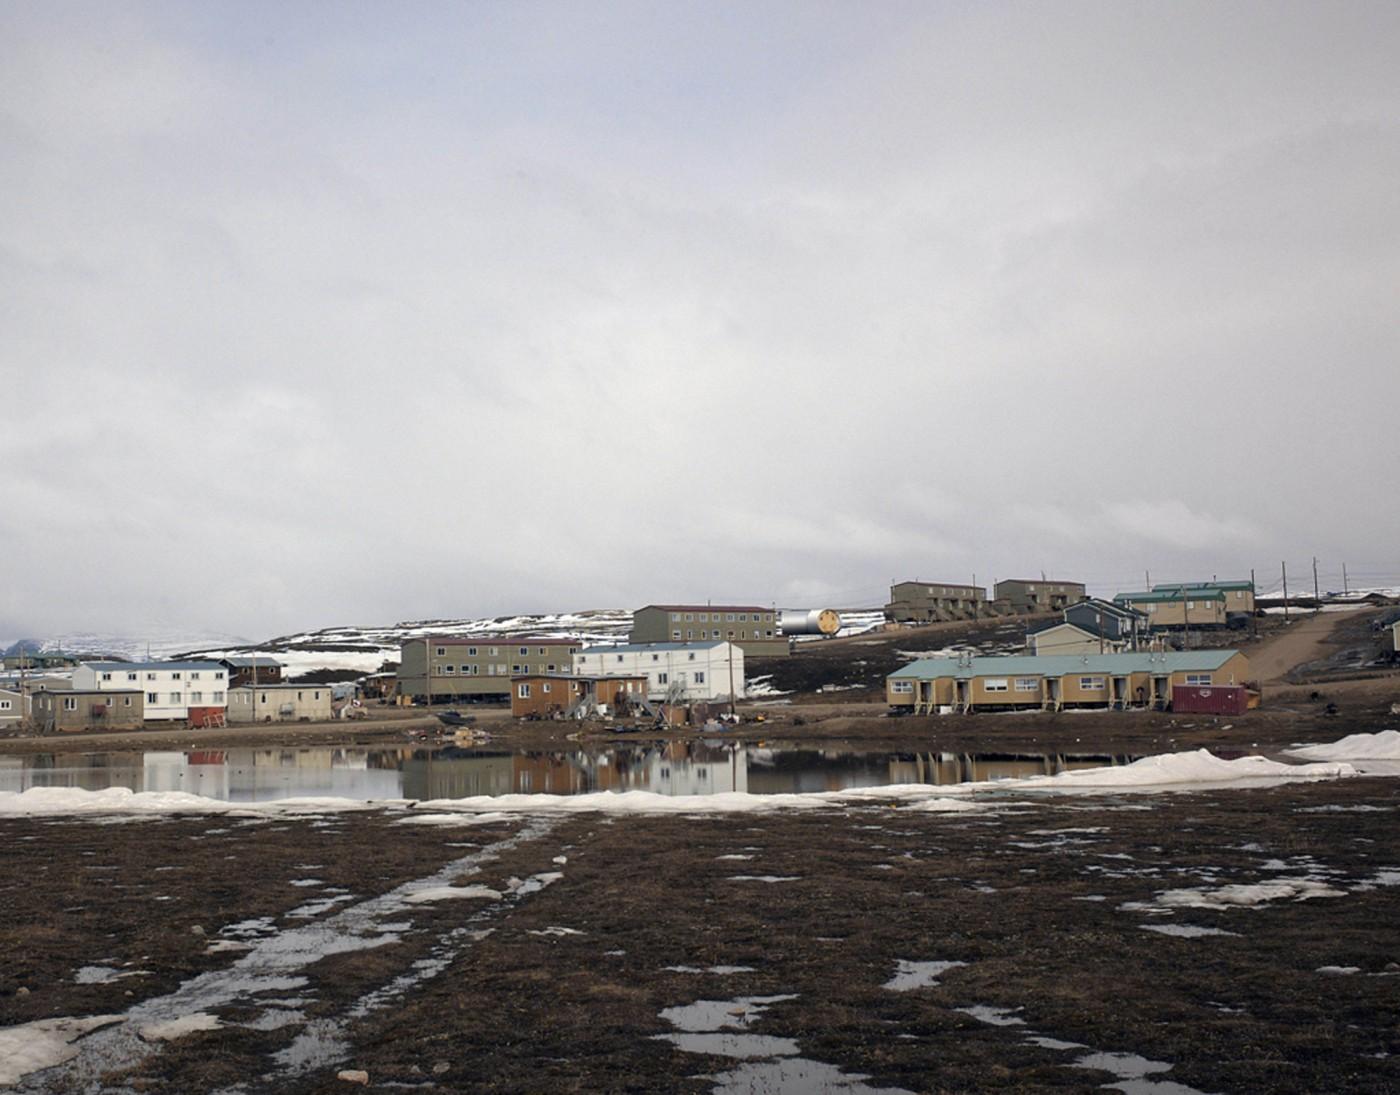 Philip Jessup, </span><span><em>Early Melt in Pond Inlet, Baffin Island</em>, </span><span>2007